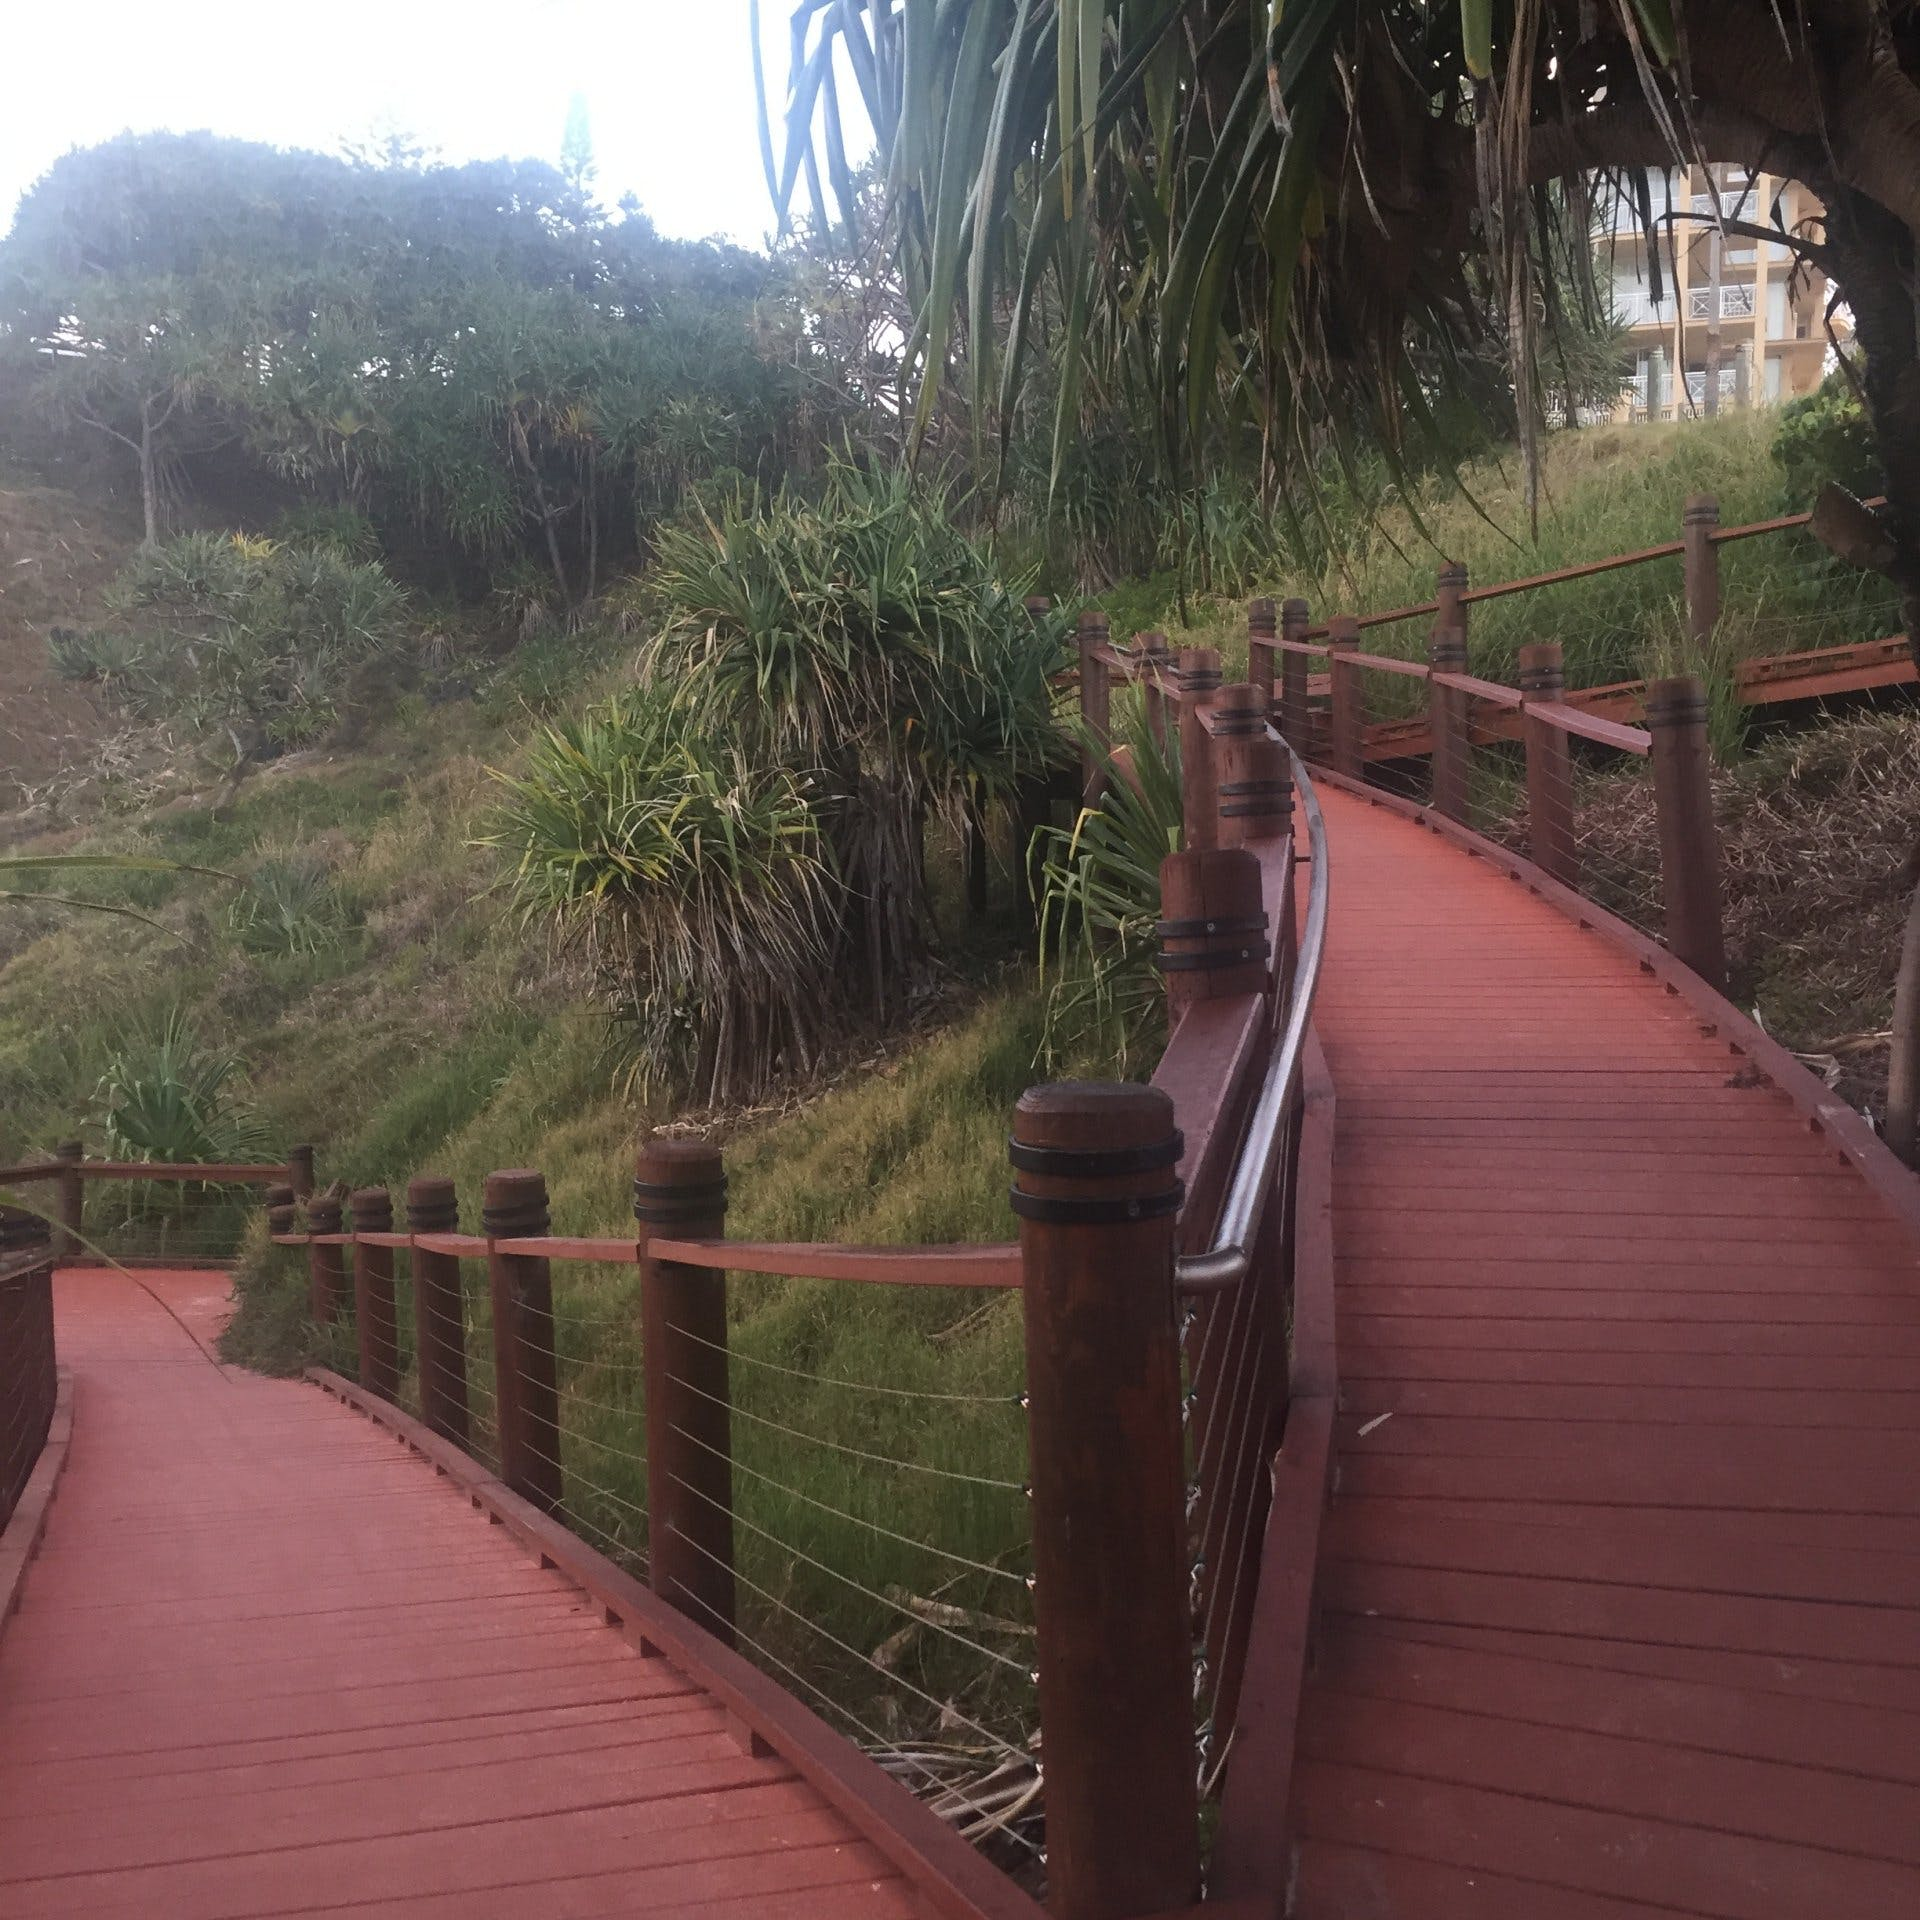 Tweed Heads - Boardwalk up to Point Danger